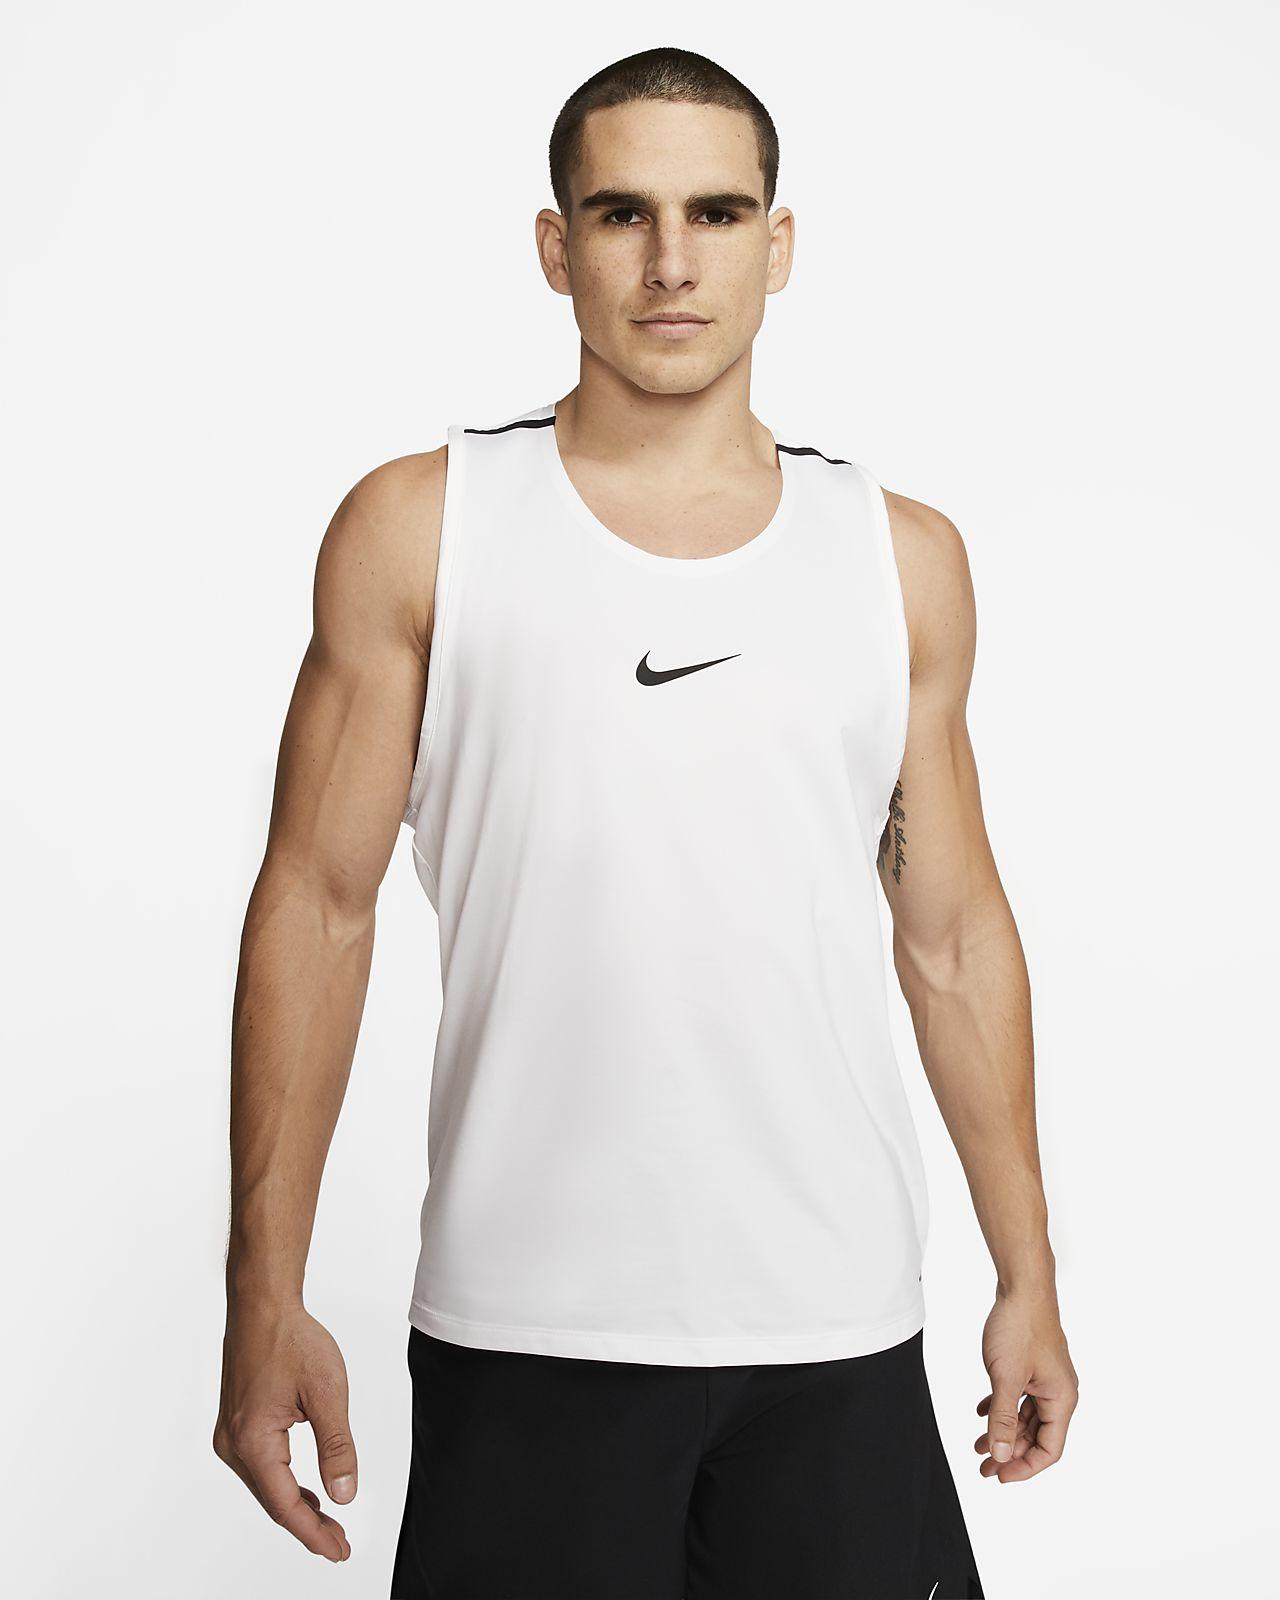 Canotta Nike Pro AeroAdapt - Uomo